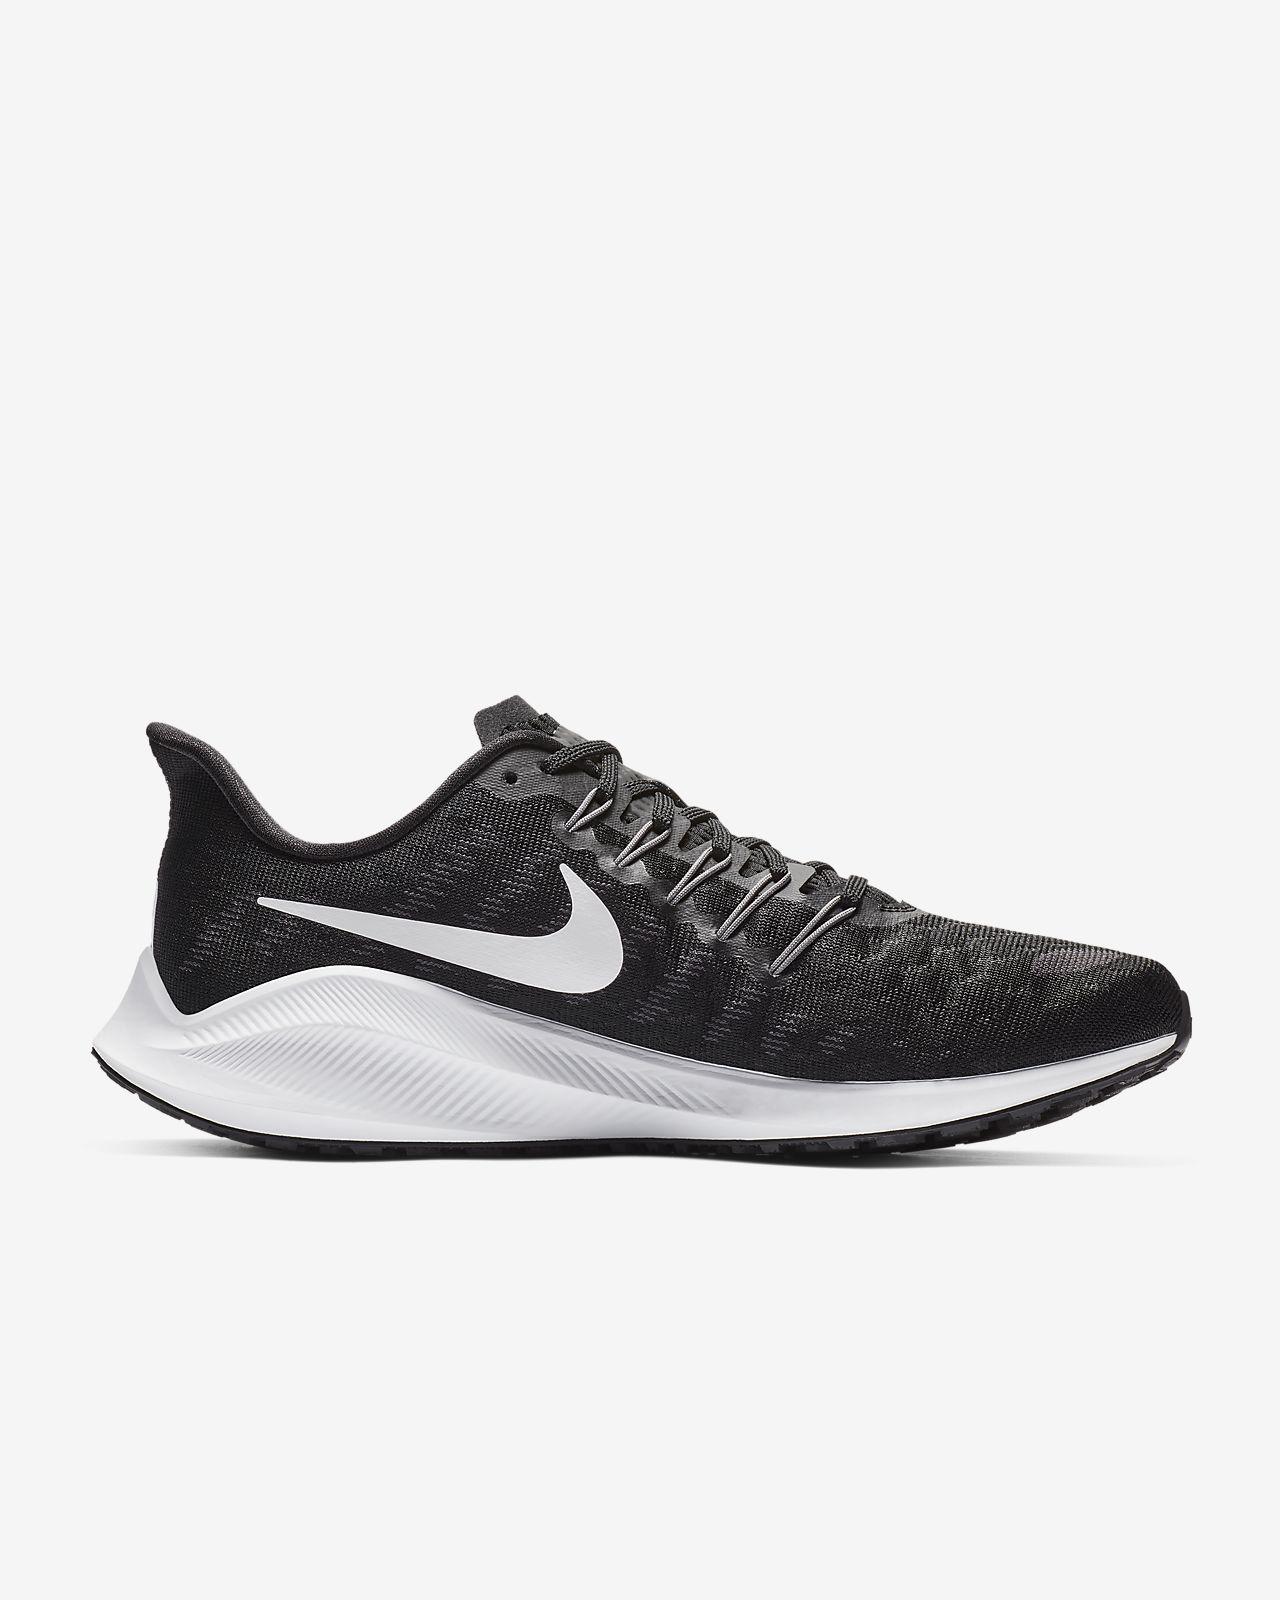 29490307392 Nike Air Zoom Vomero 14 Men s Running Shoe. Nike.com IN